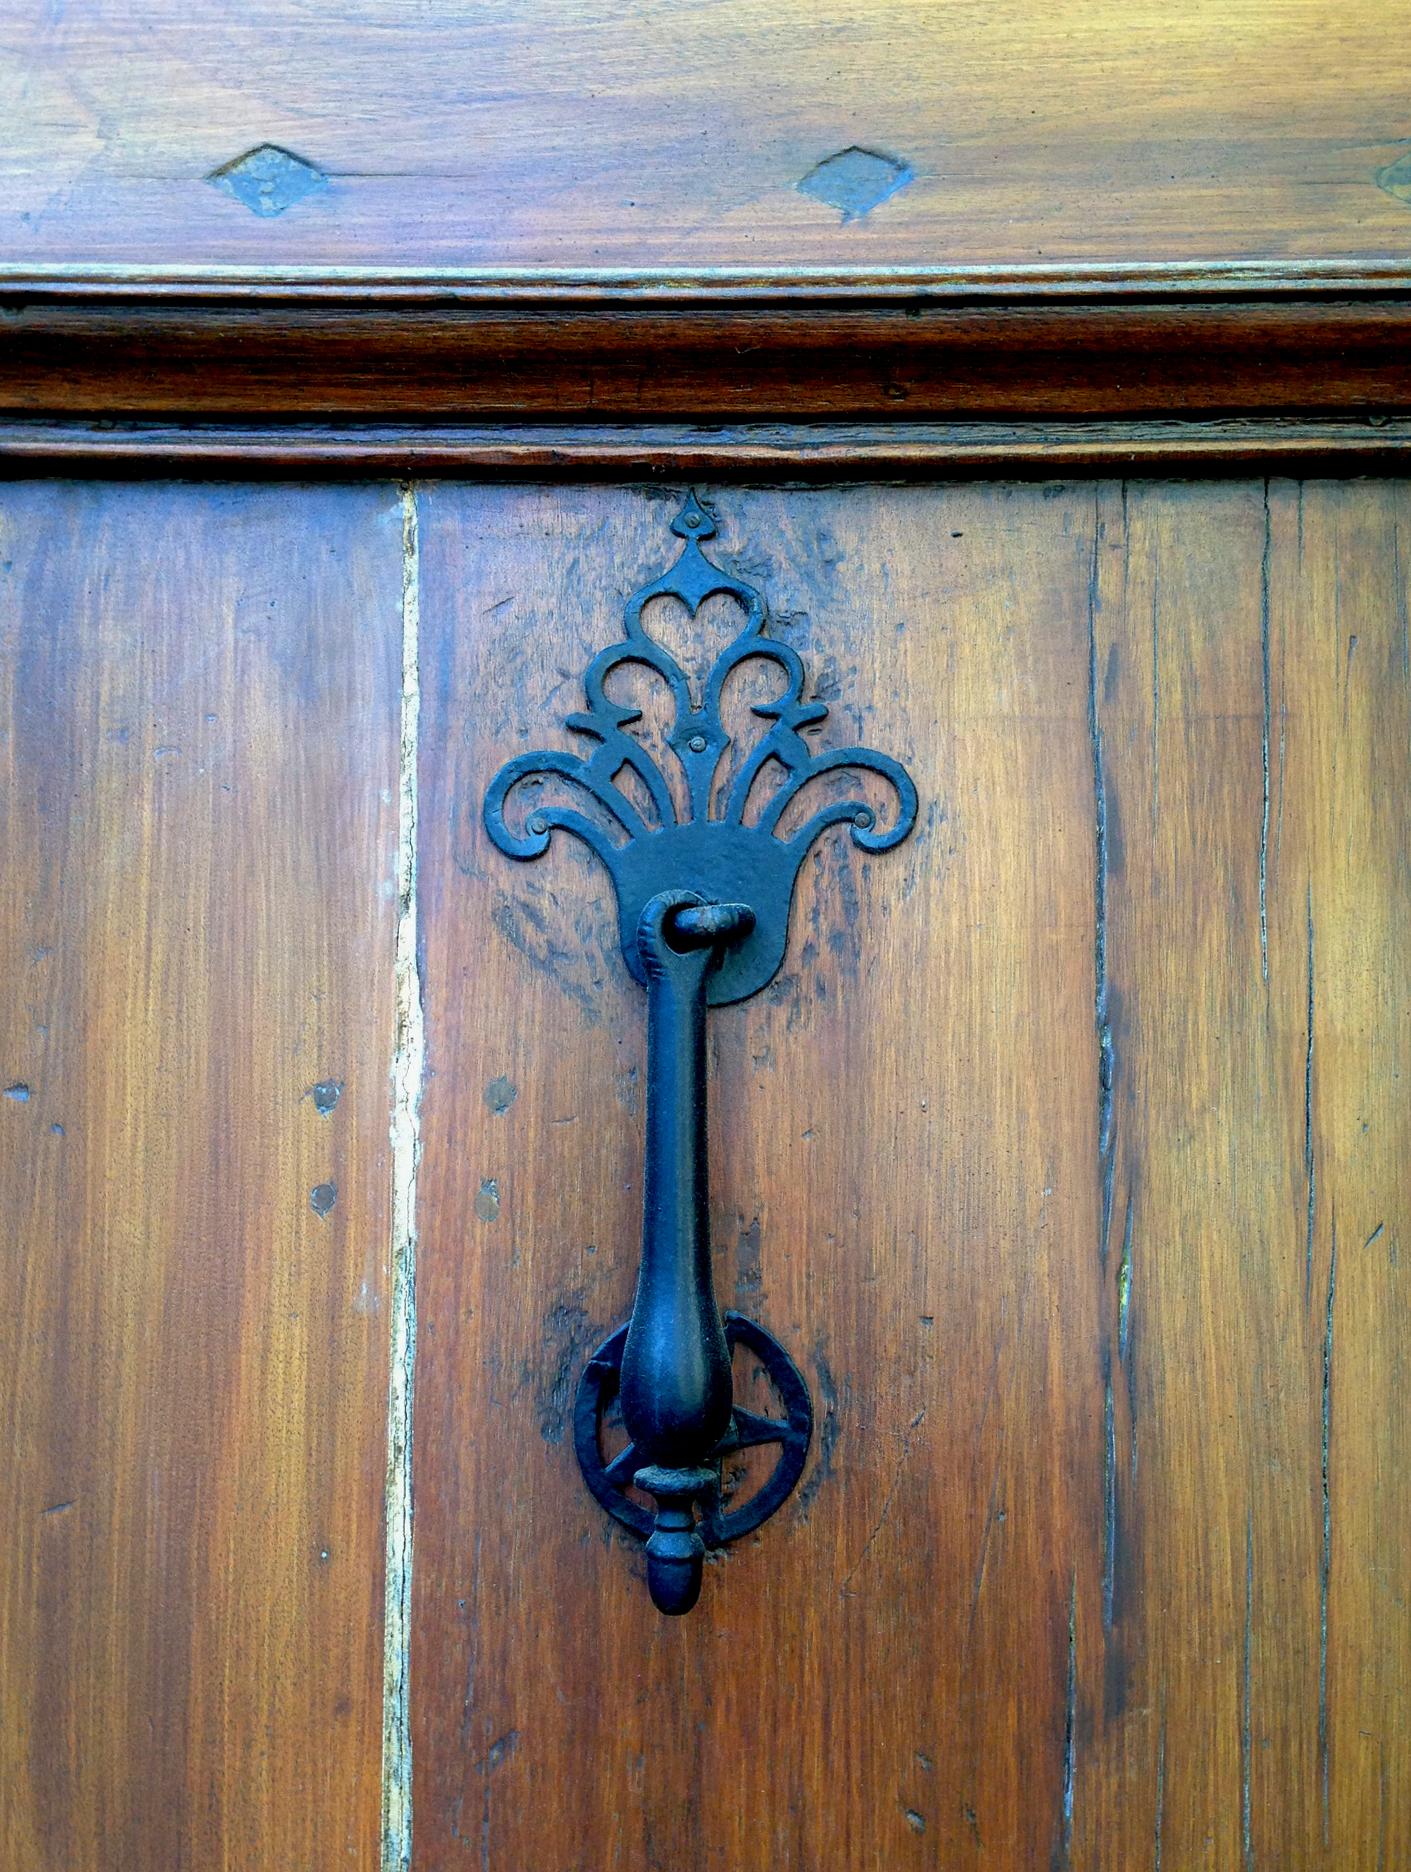 A more ornate hammer-style knocker